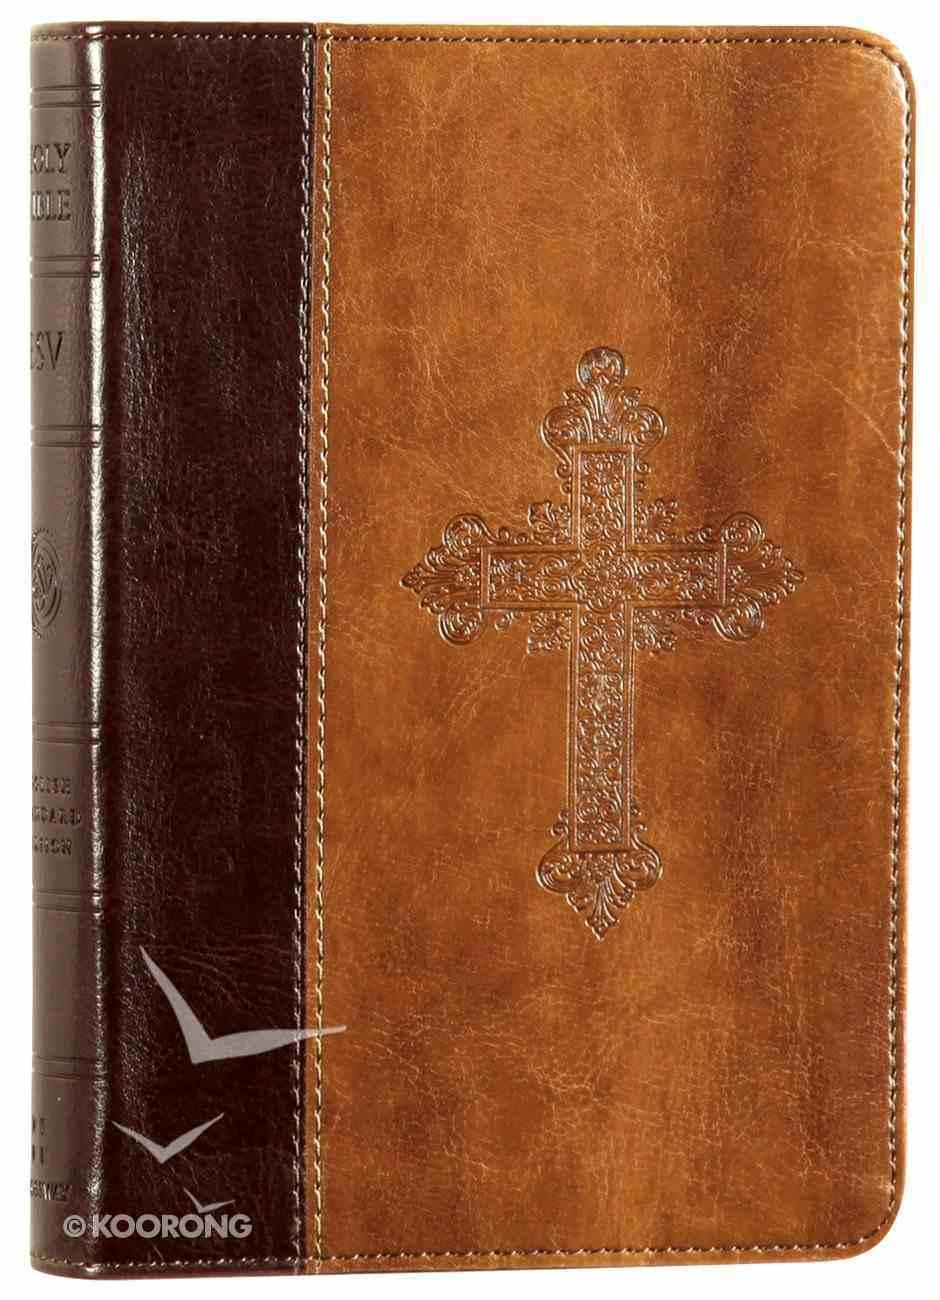 ESV Large Print Compact Bible Trutone Vintage Cross Design Burgundy/Tan Imitation Leather